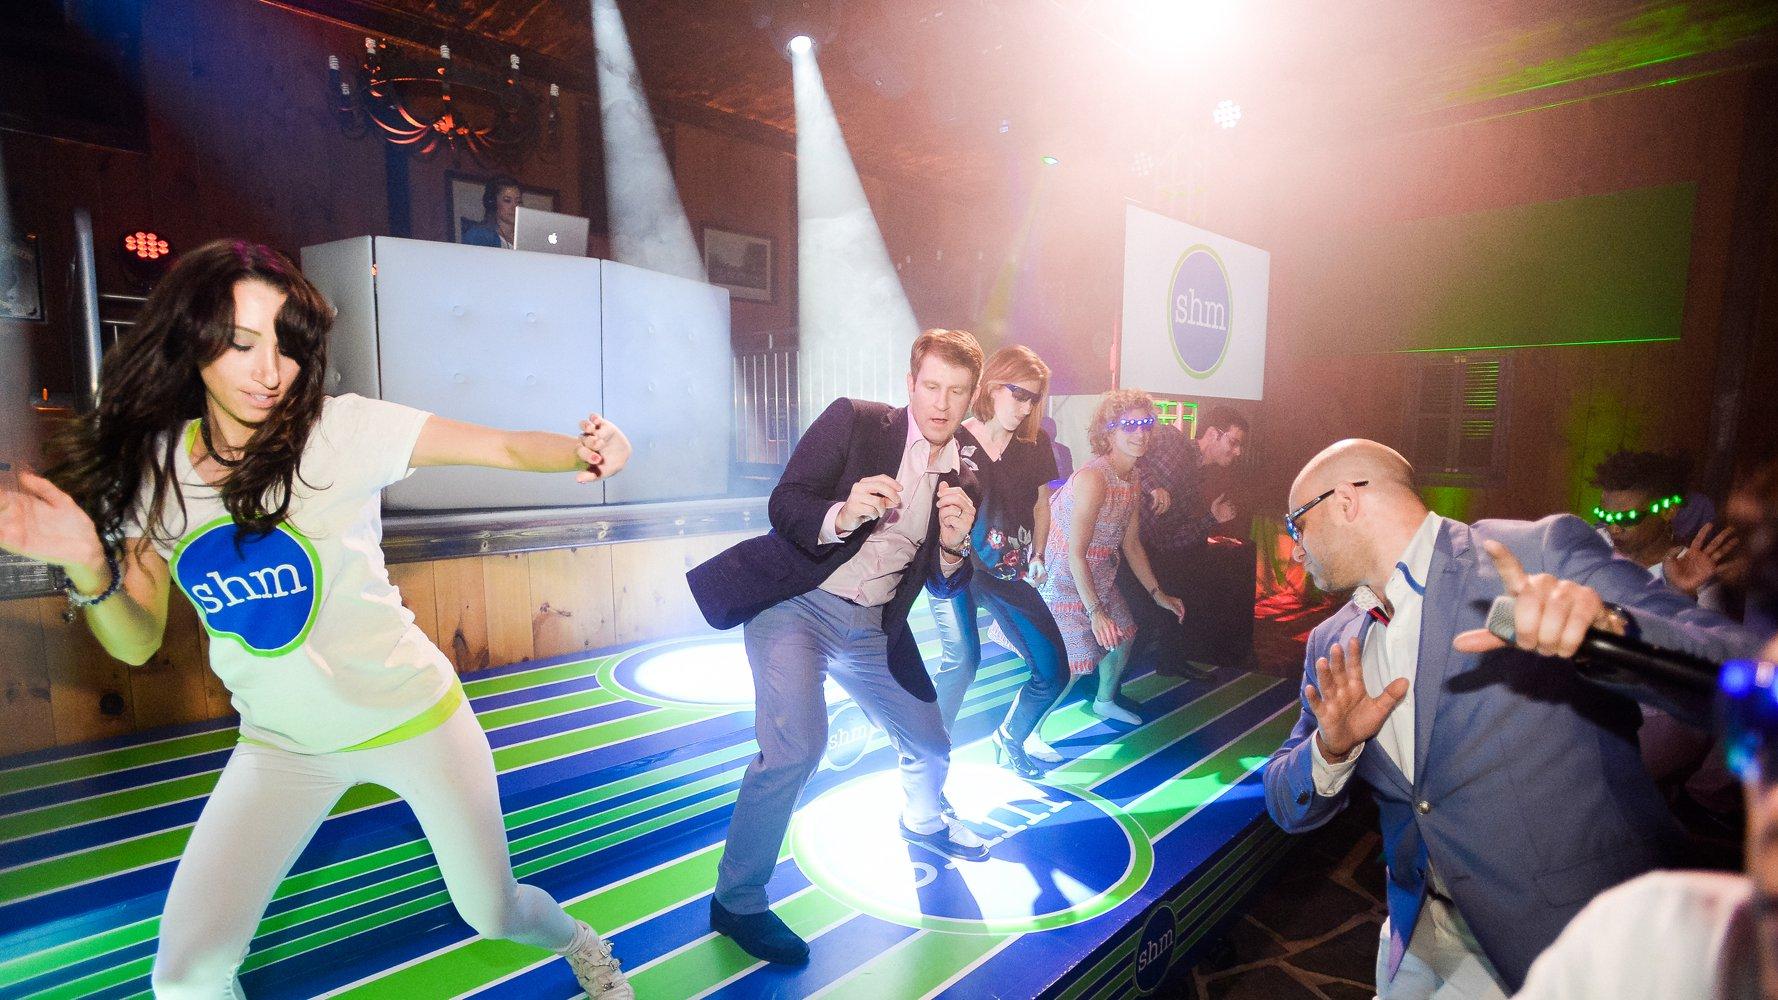 Bar Mitzvah adults on raised dance floor